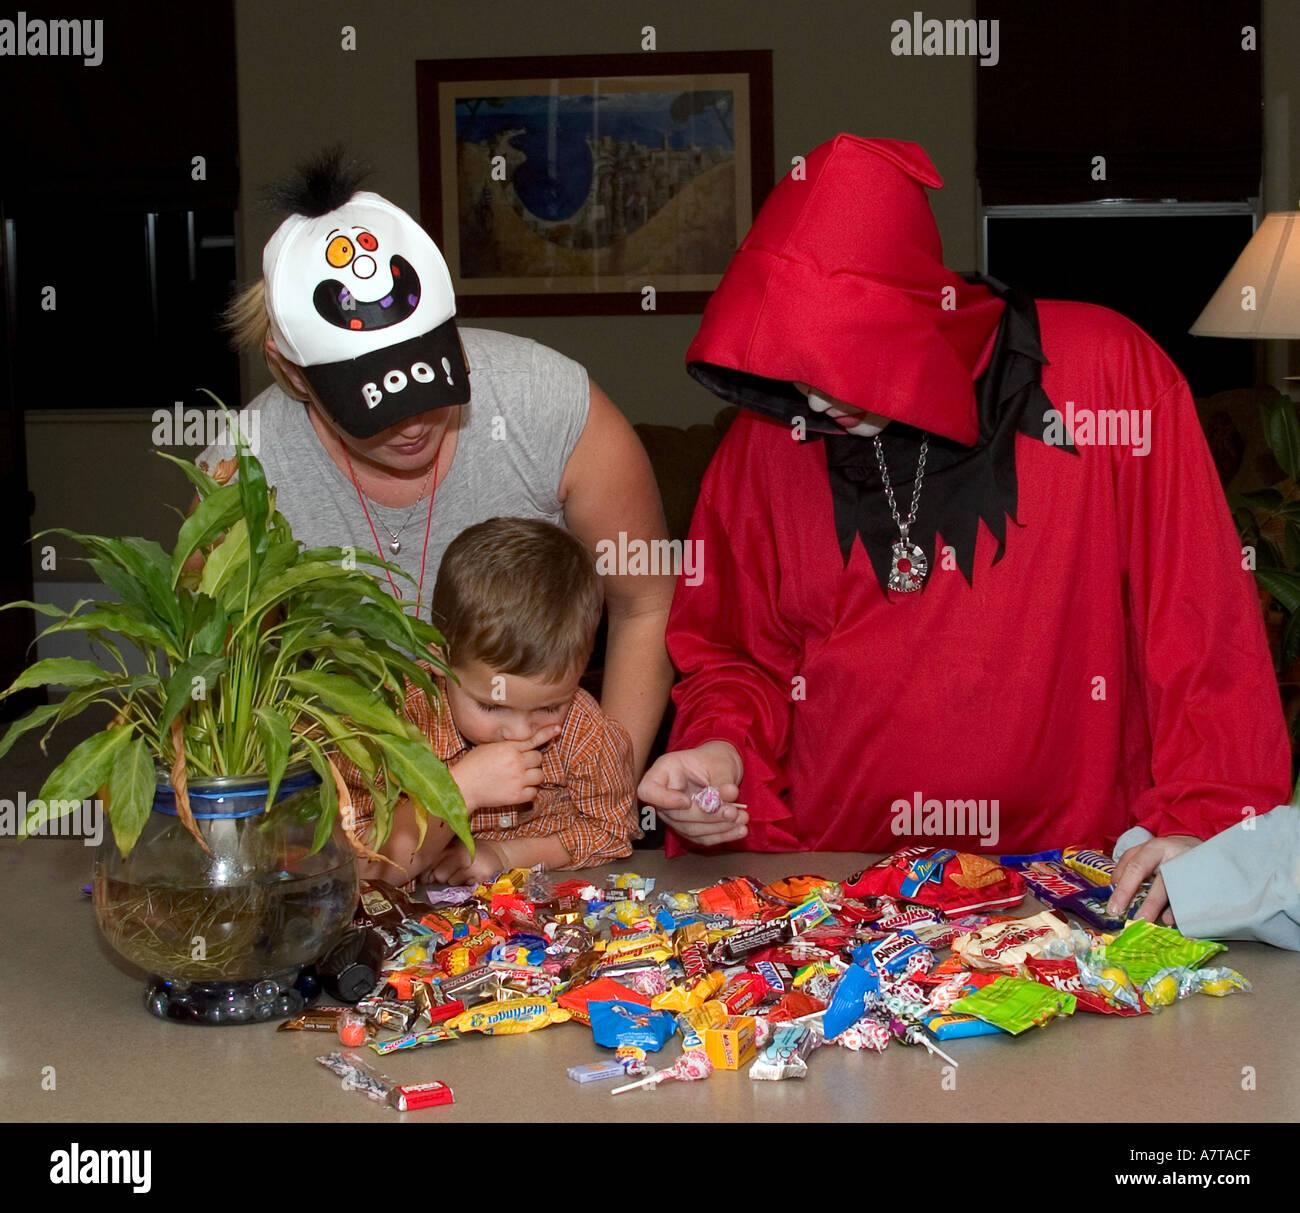 Halloween loot - Stock Image